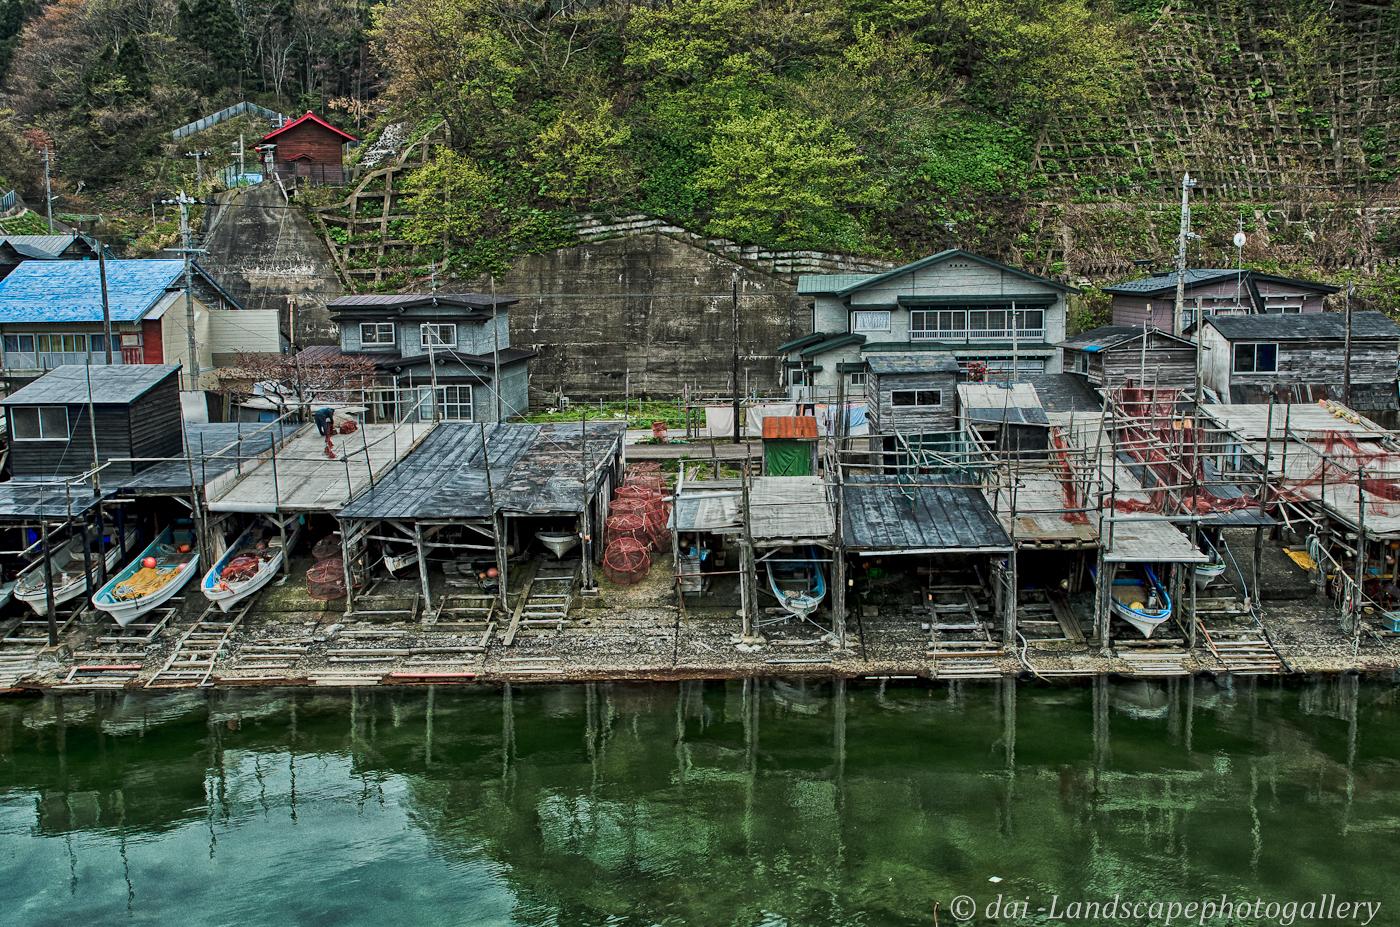 三厩梹榔の漁村風景【HDRi】